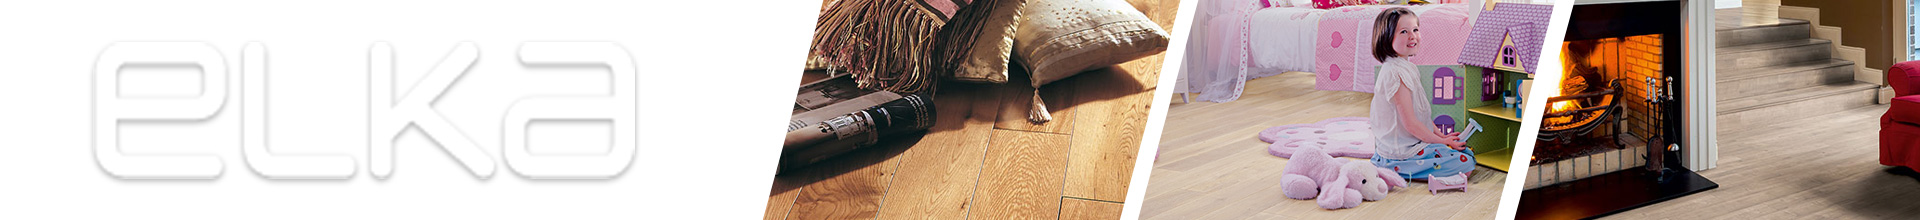 John Lynch Carpets - Elka